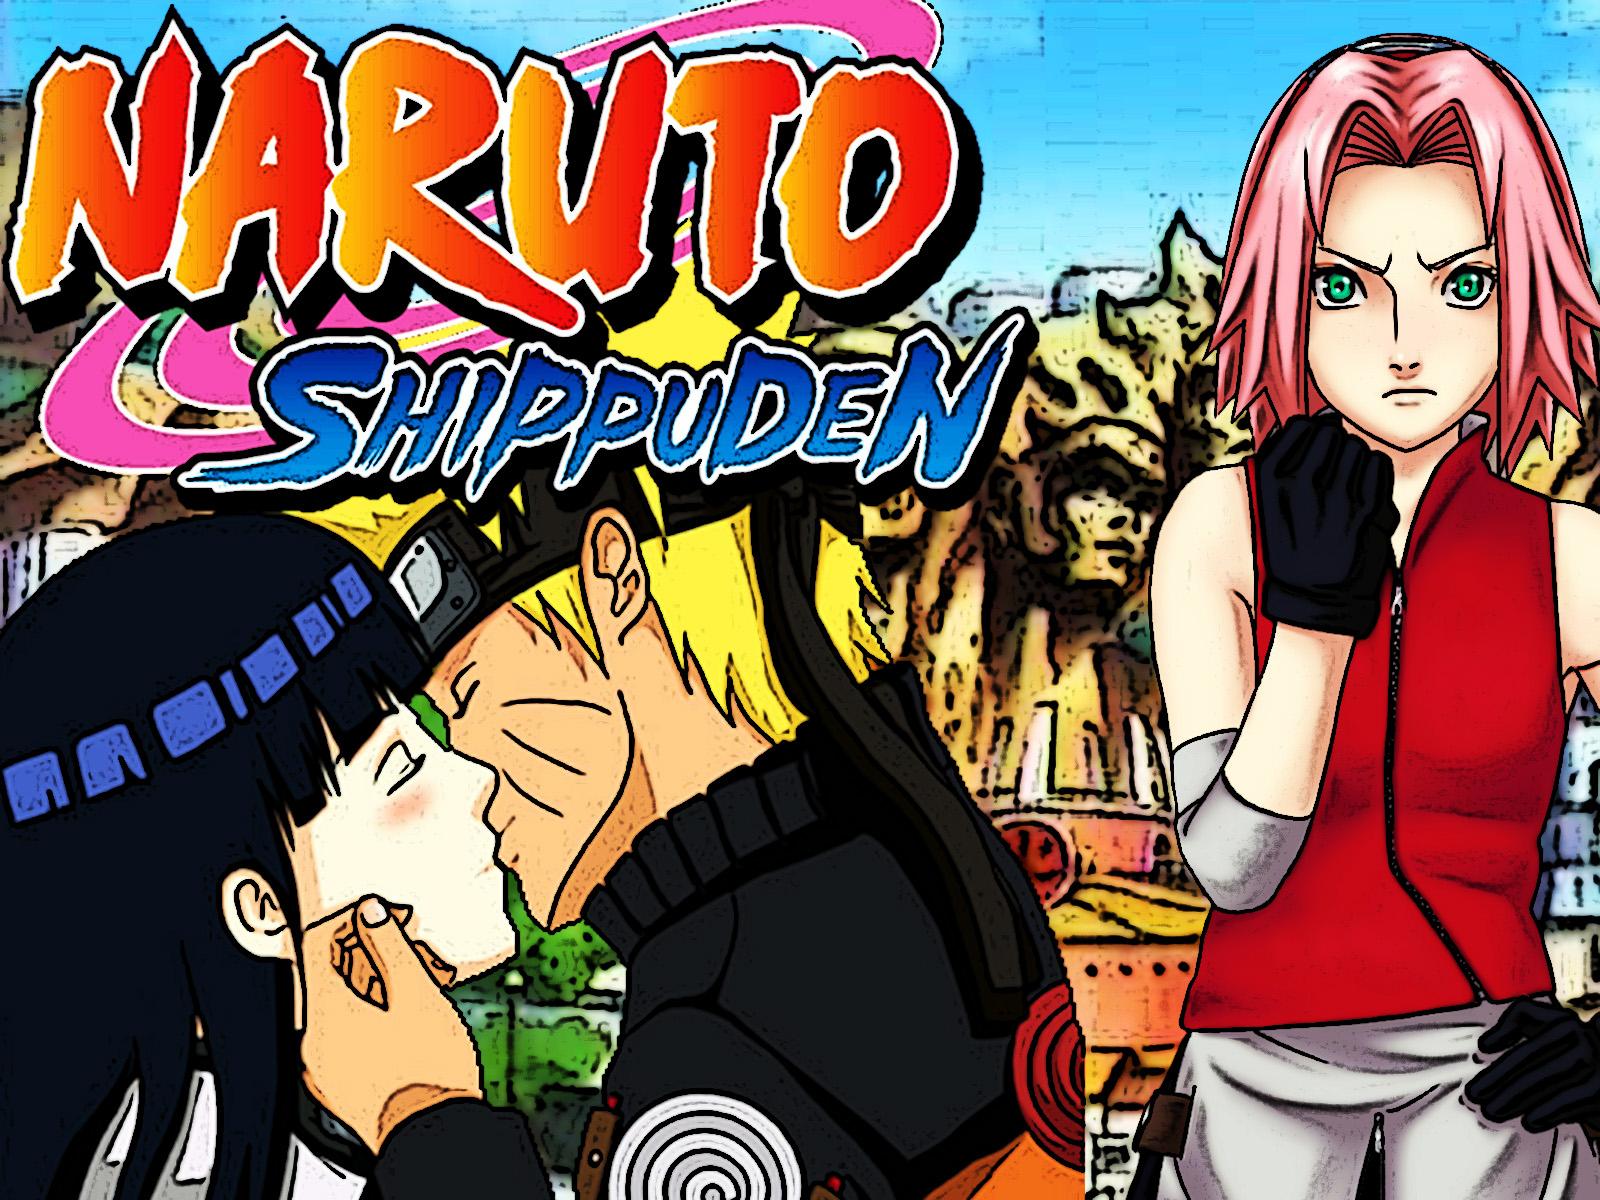 http://4.bp.blogspot.com/-lyVJ60NCqPM/TtlKg9h5SiI/AAAAAAAAA9E/FF-0ZvXbl_Y/s1600/Naruto_Sakura_Hinata.jpg